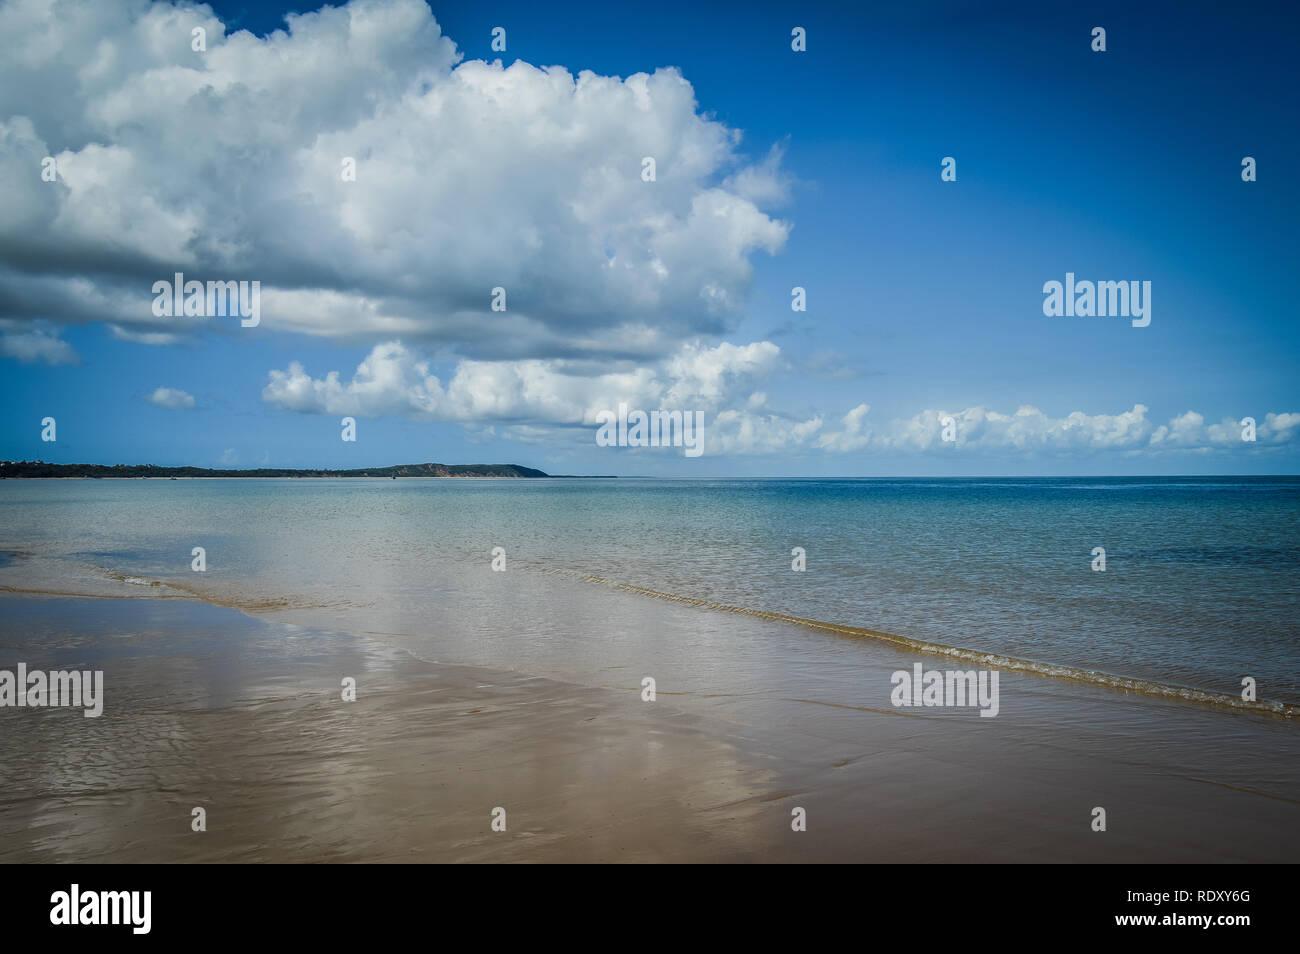 Pristine and Turquoise Portuguese Island beach near Inhaca Island in Maputo Mozambique Stock Photo